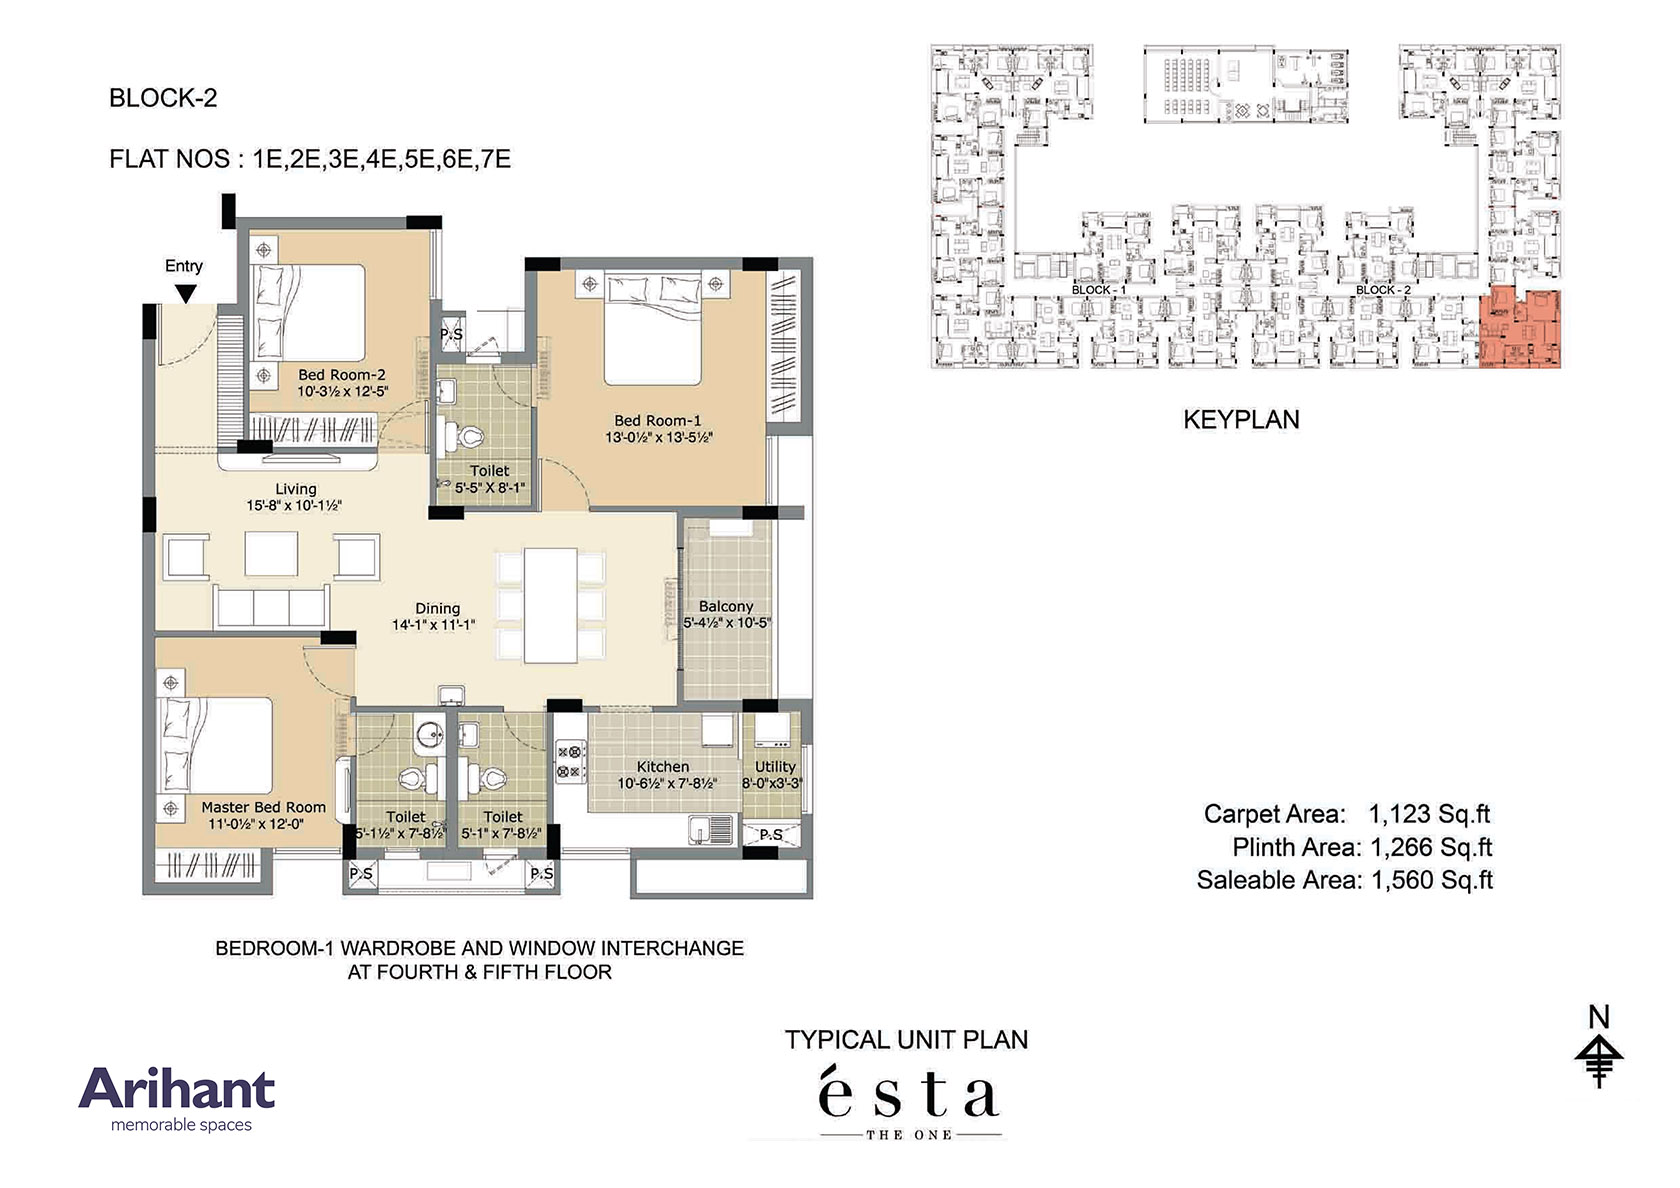 Arihant - Esta_Typical Unit Plan - Block 2 - Type E